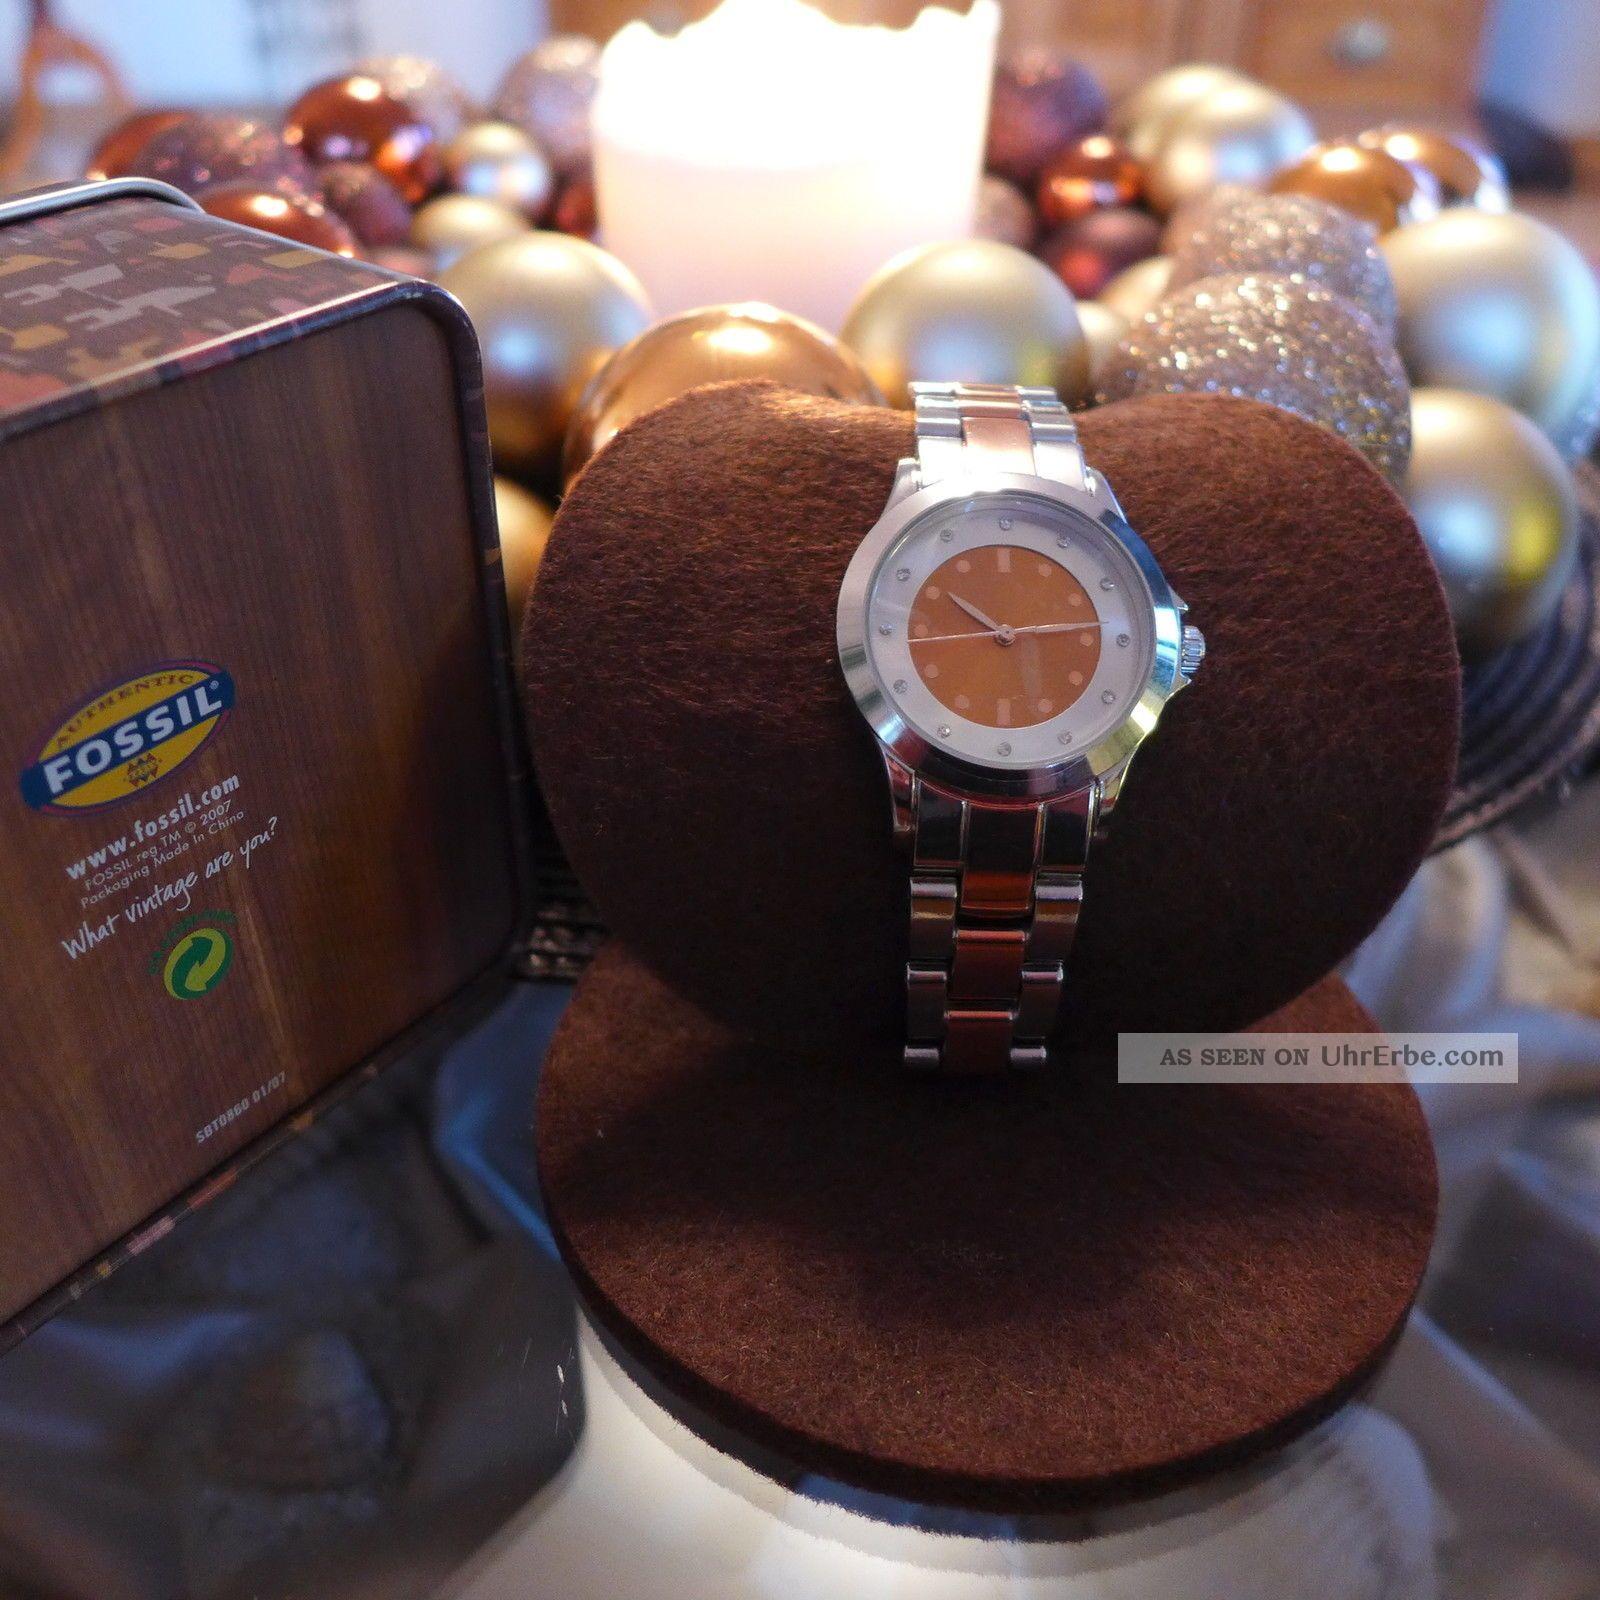 Damenuhr Silber Und Rosegold Farben In Fossil Box Armbanduhren Bild